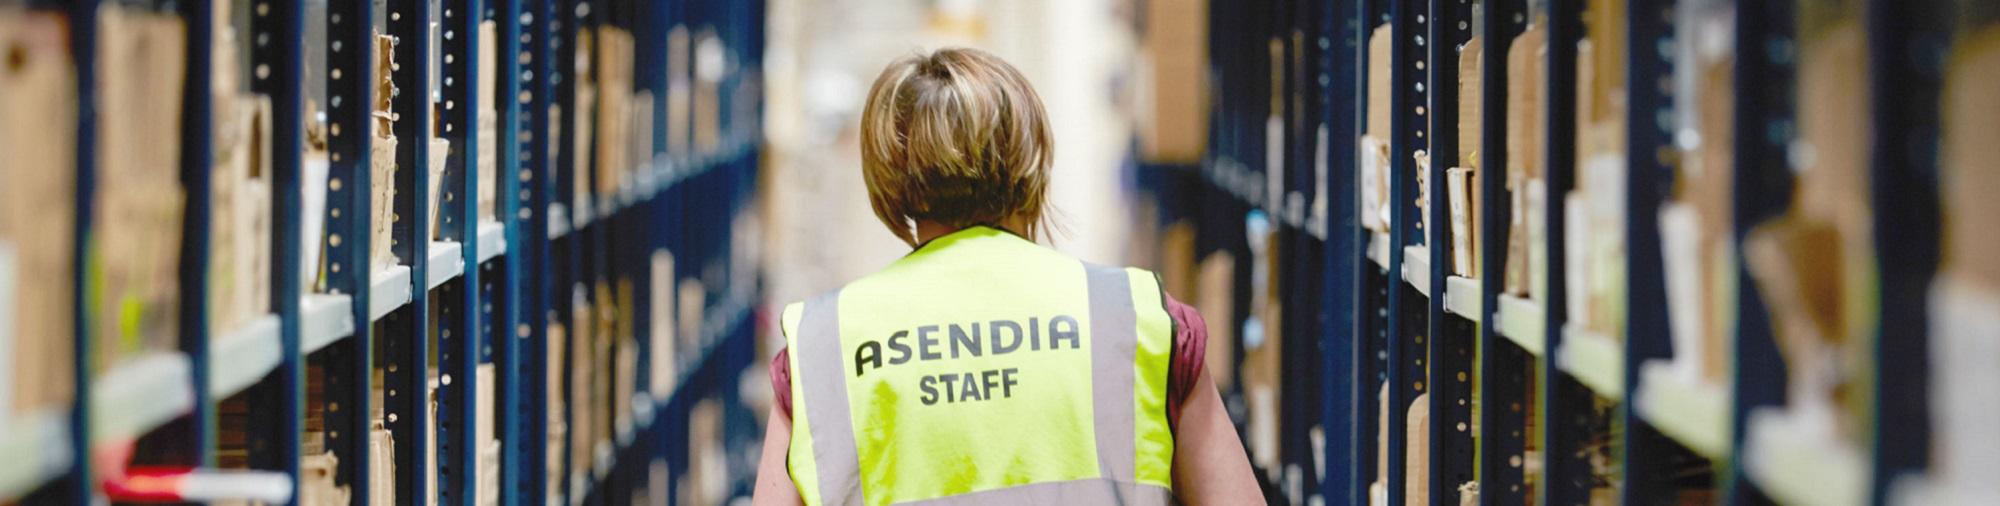 Asendia Careers header